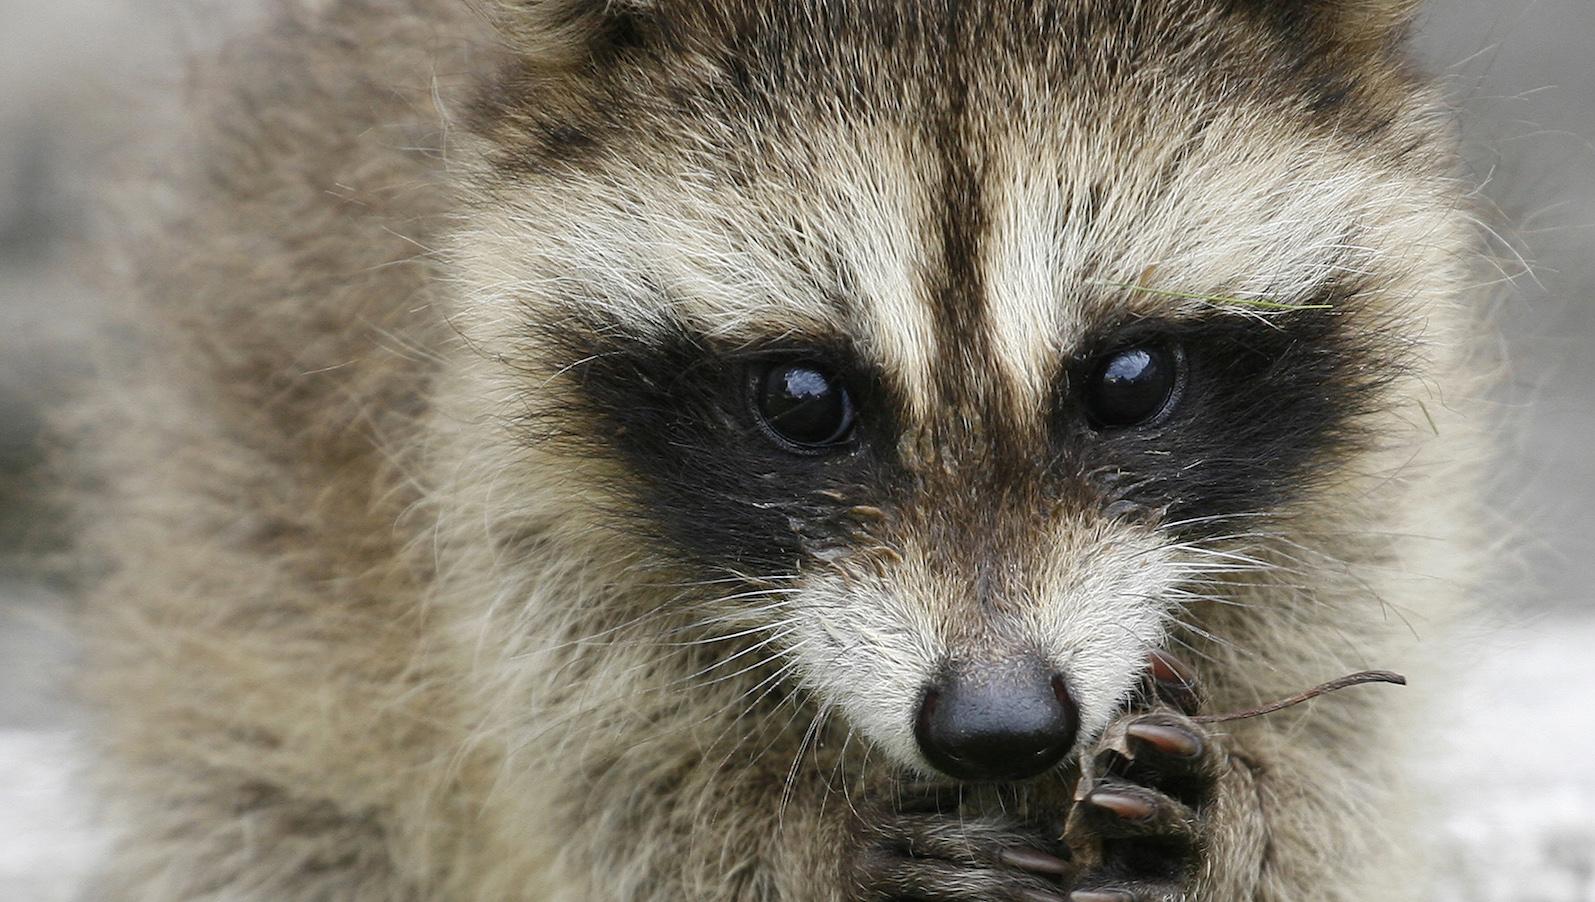 A raccoon cub at the Royev Ruchey zoo in the Siberian city of Krasnoyarsk.